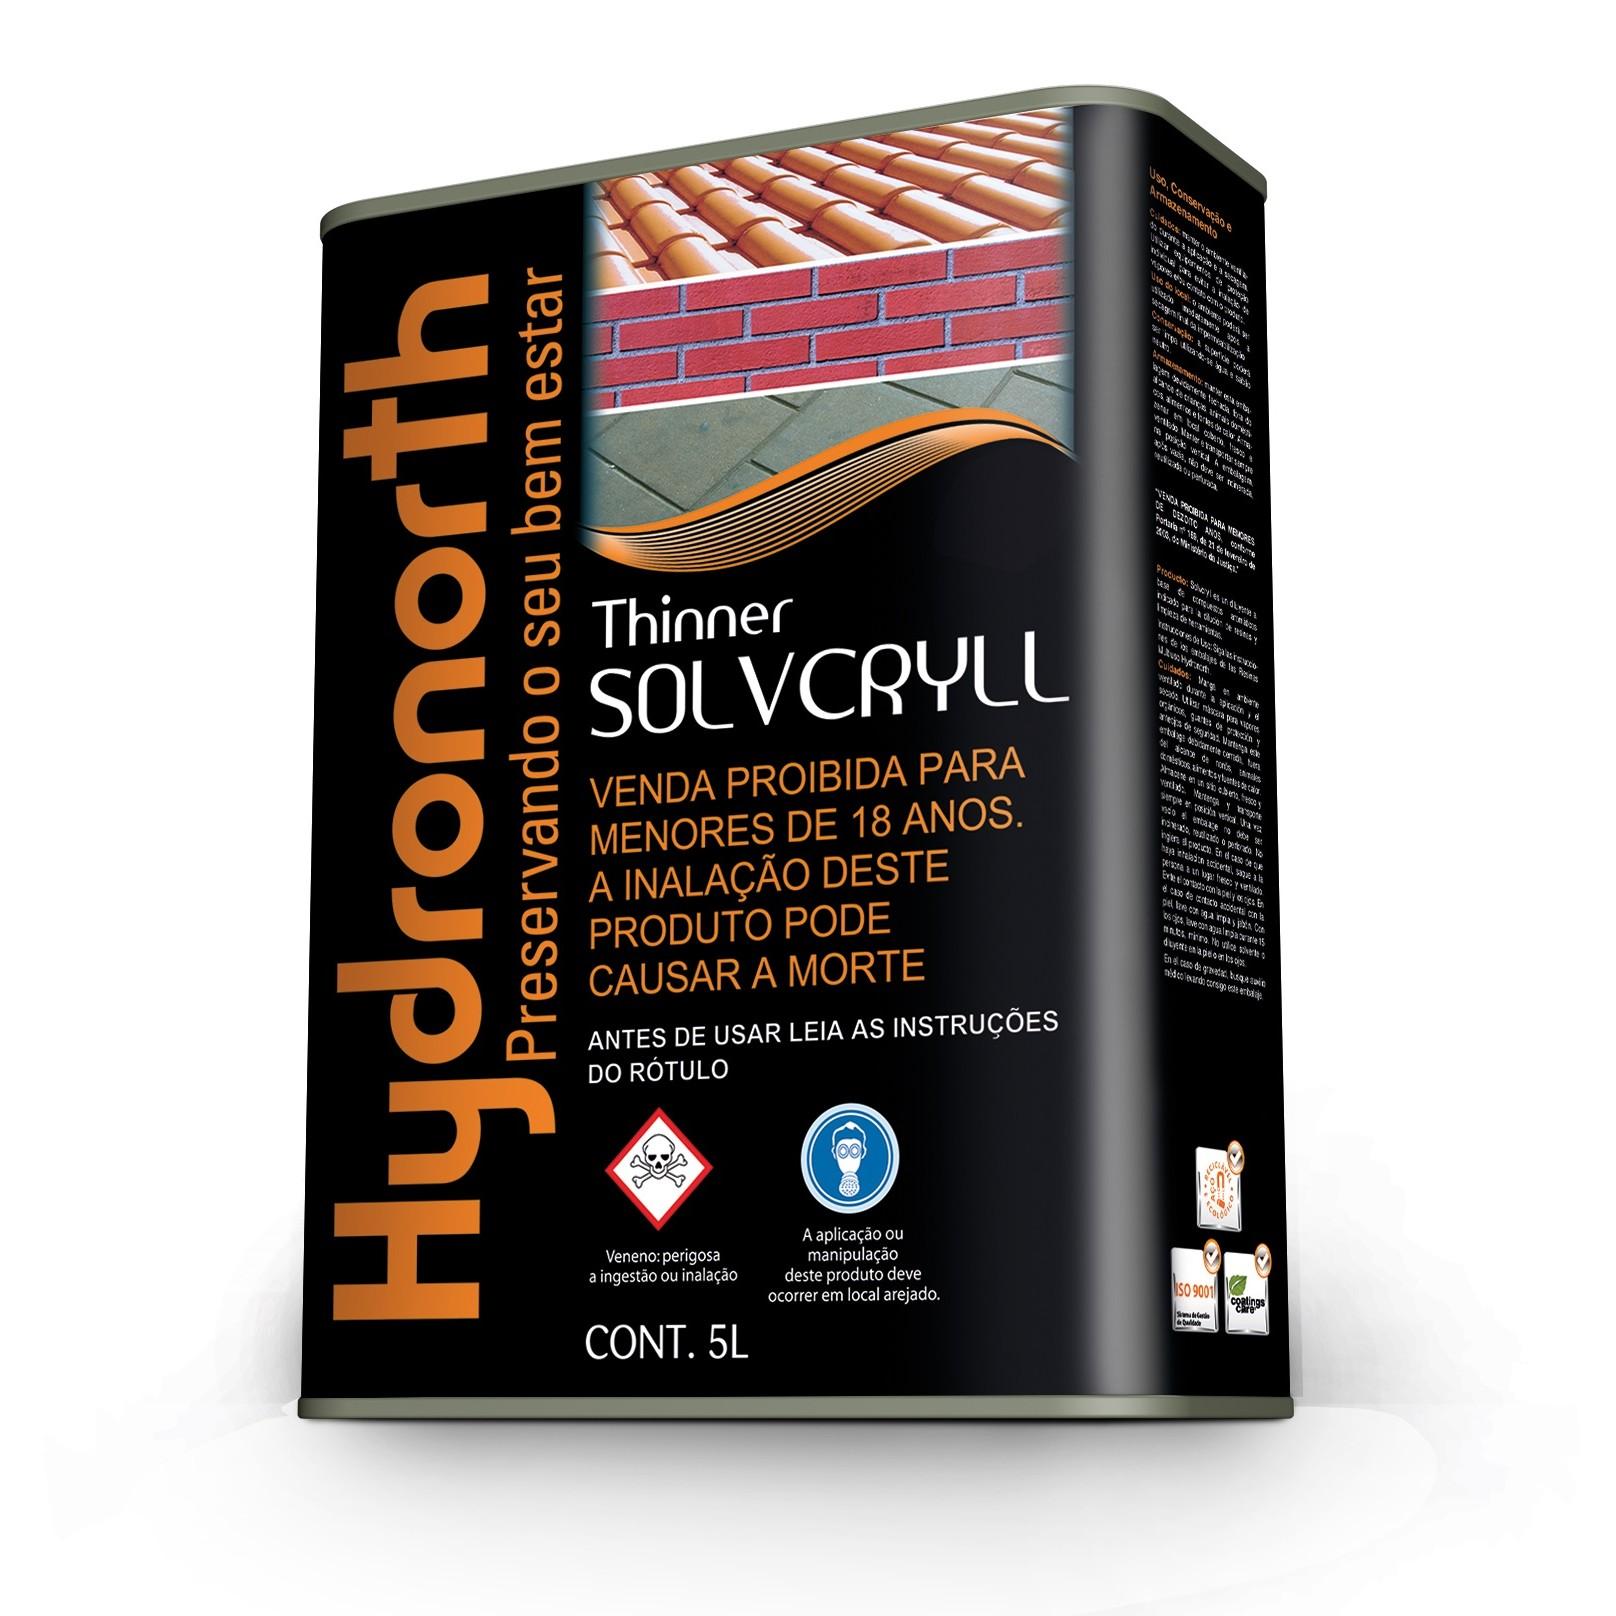 Solvente para Resina Thinner Sovcryll 5 Litros - Hydronorth